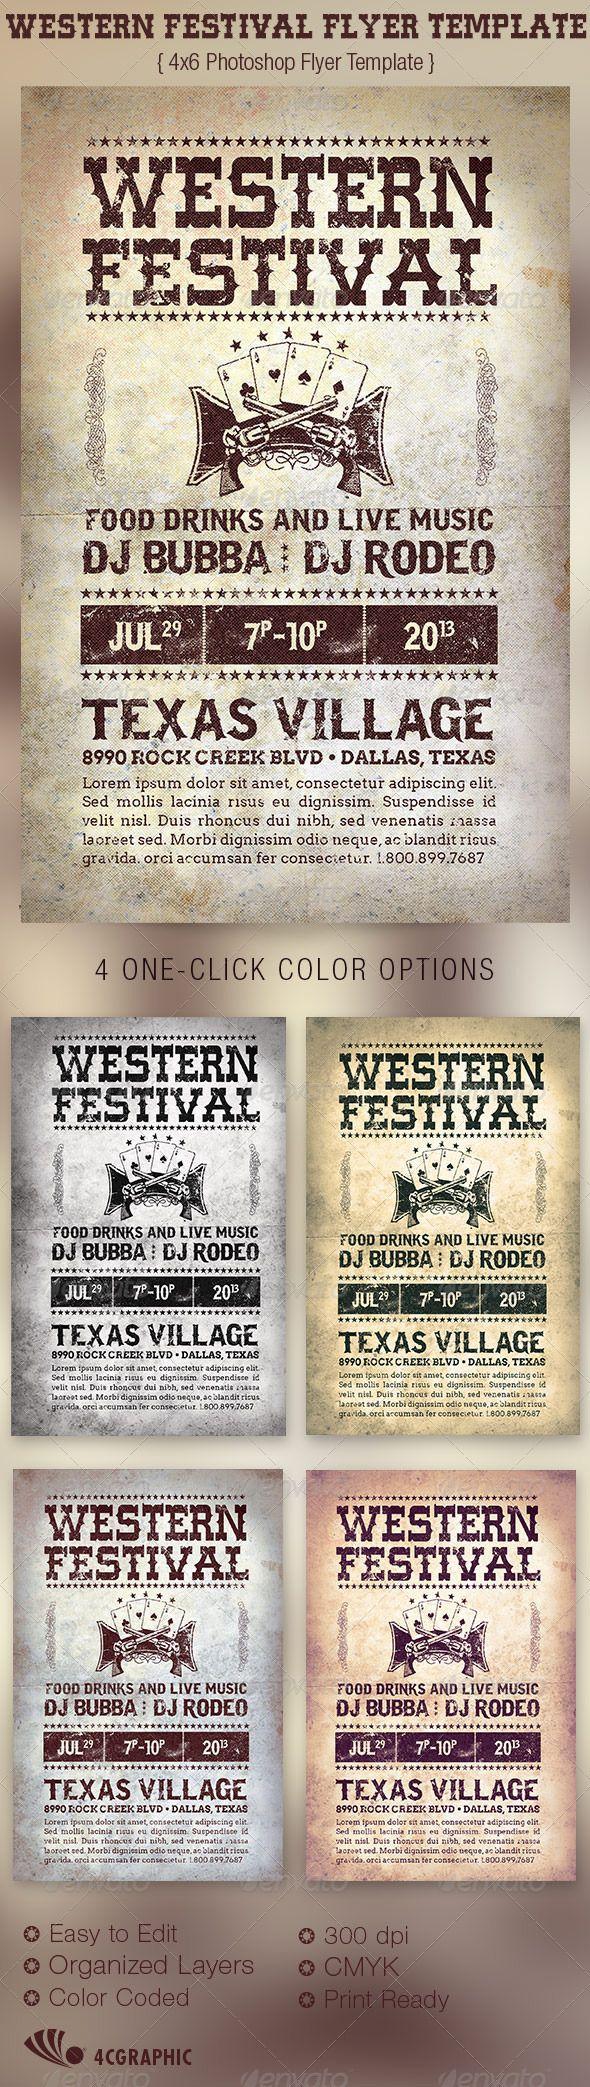 Western Festival Flyer Template  Luncheon Flyer Template